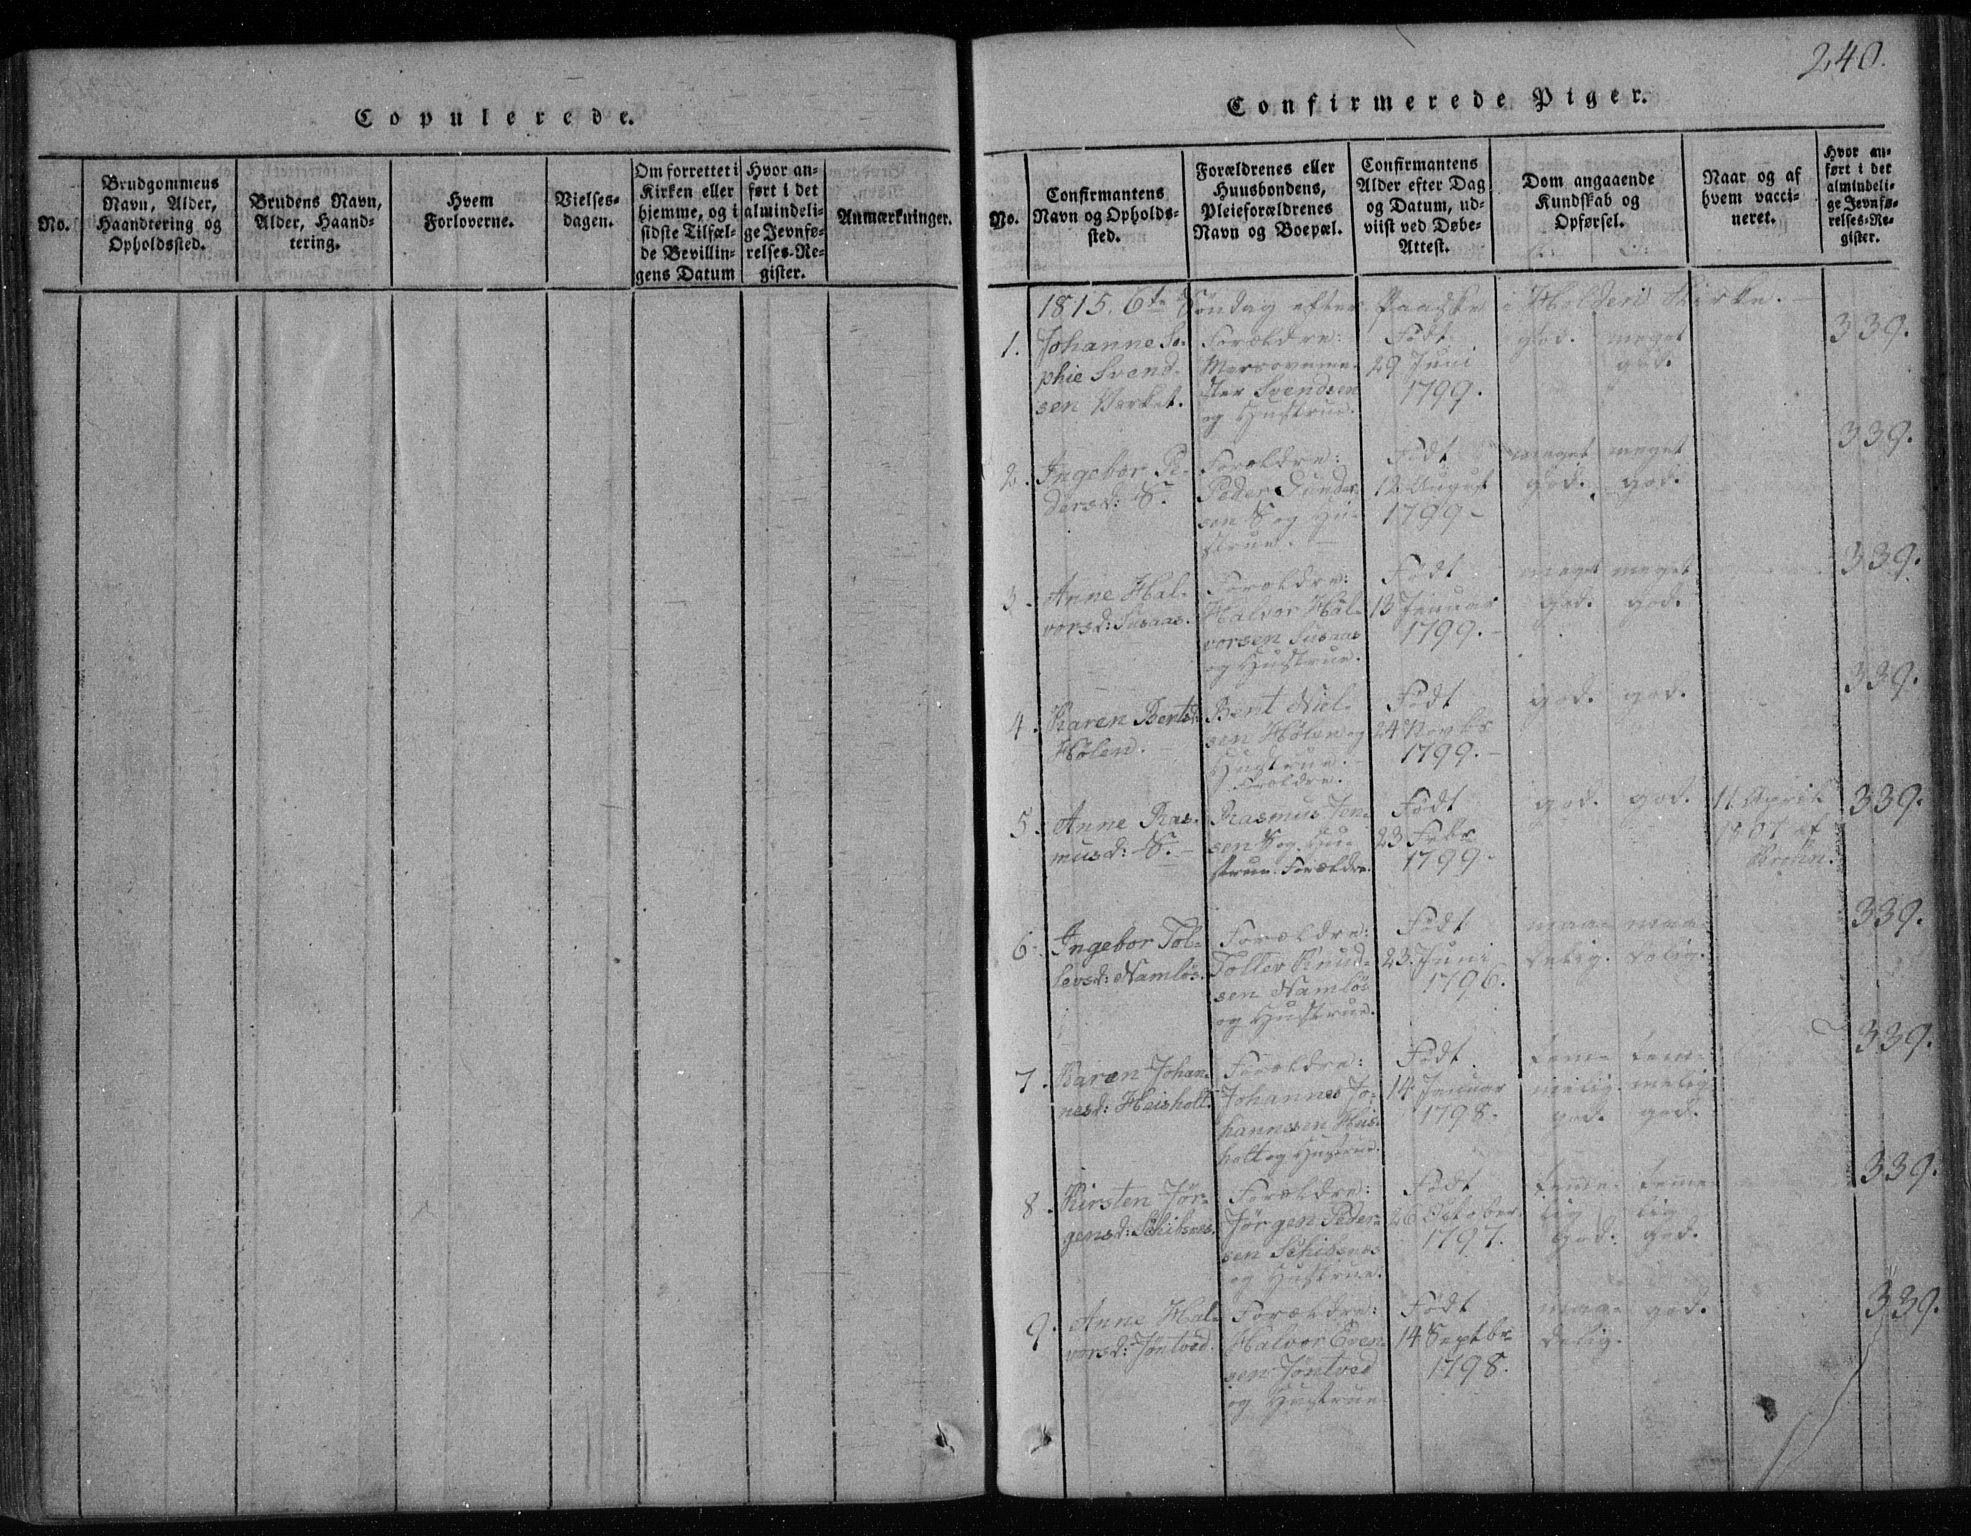 SAKO, Holla kirkebøker, F/Fa/L0003: Ministerialbok nr. 3, 1815-1830, s. 240